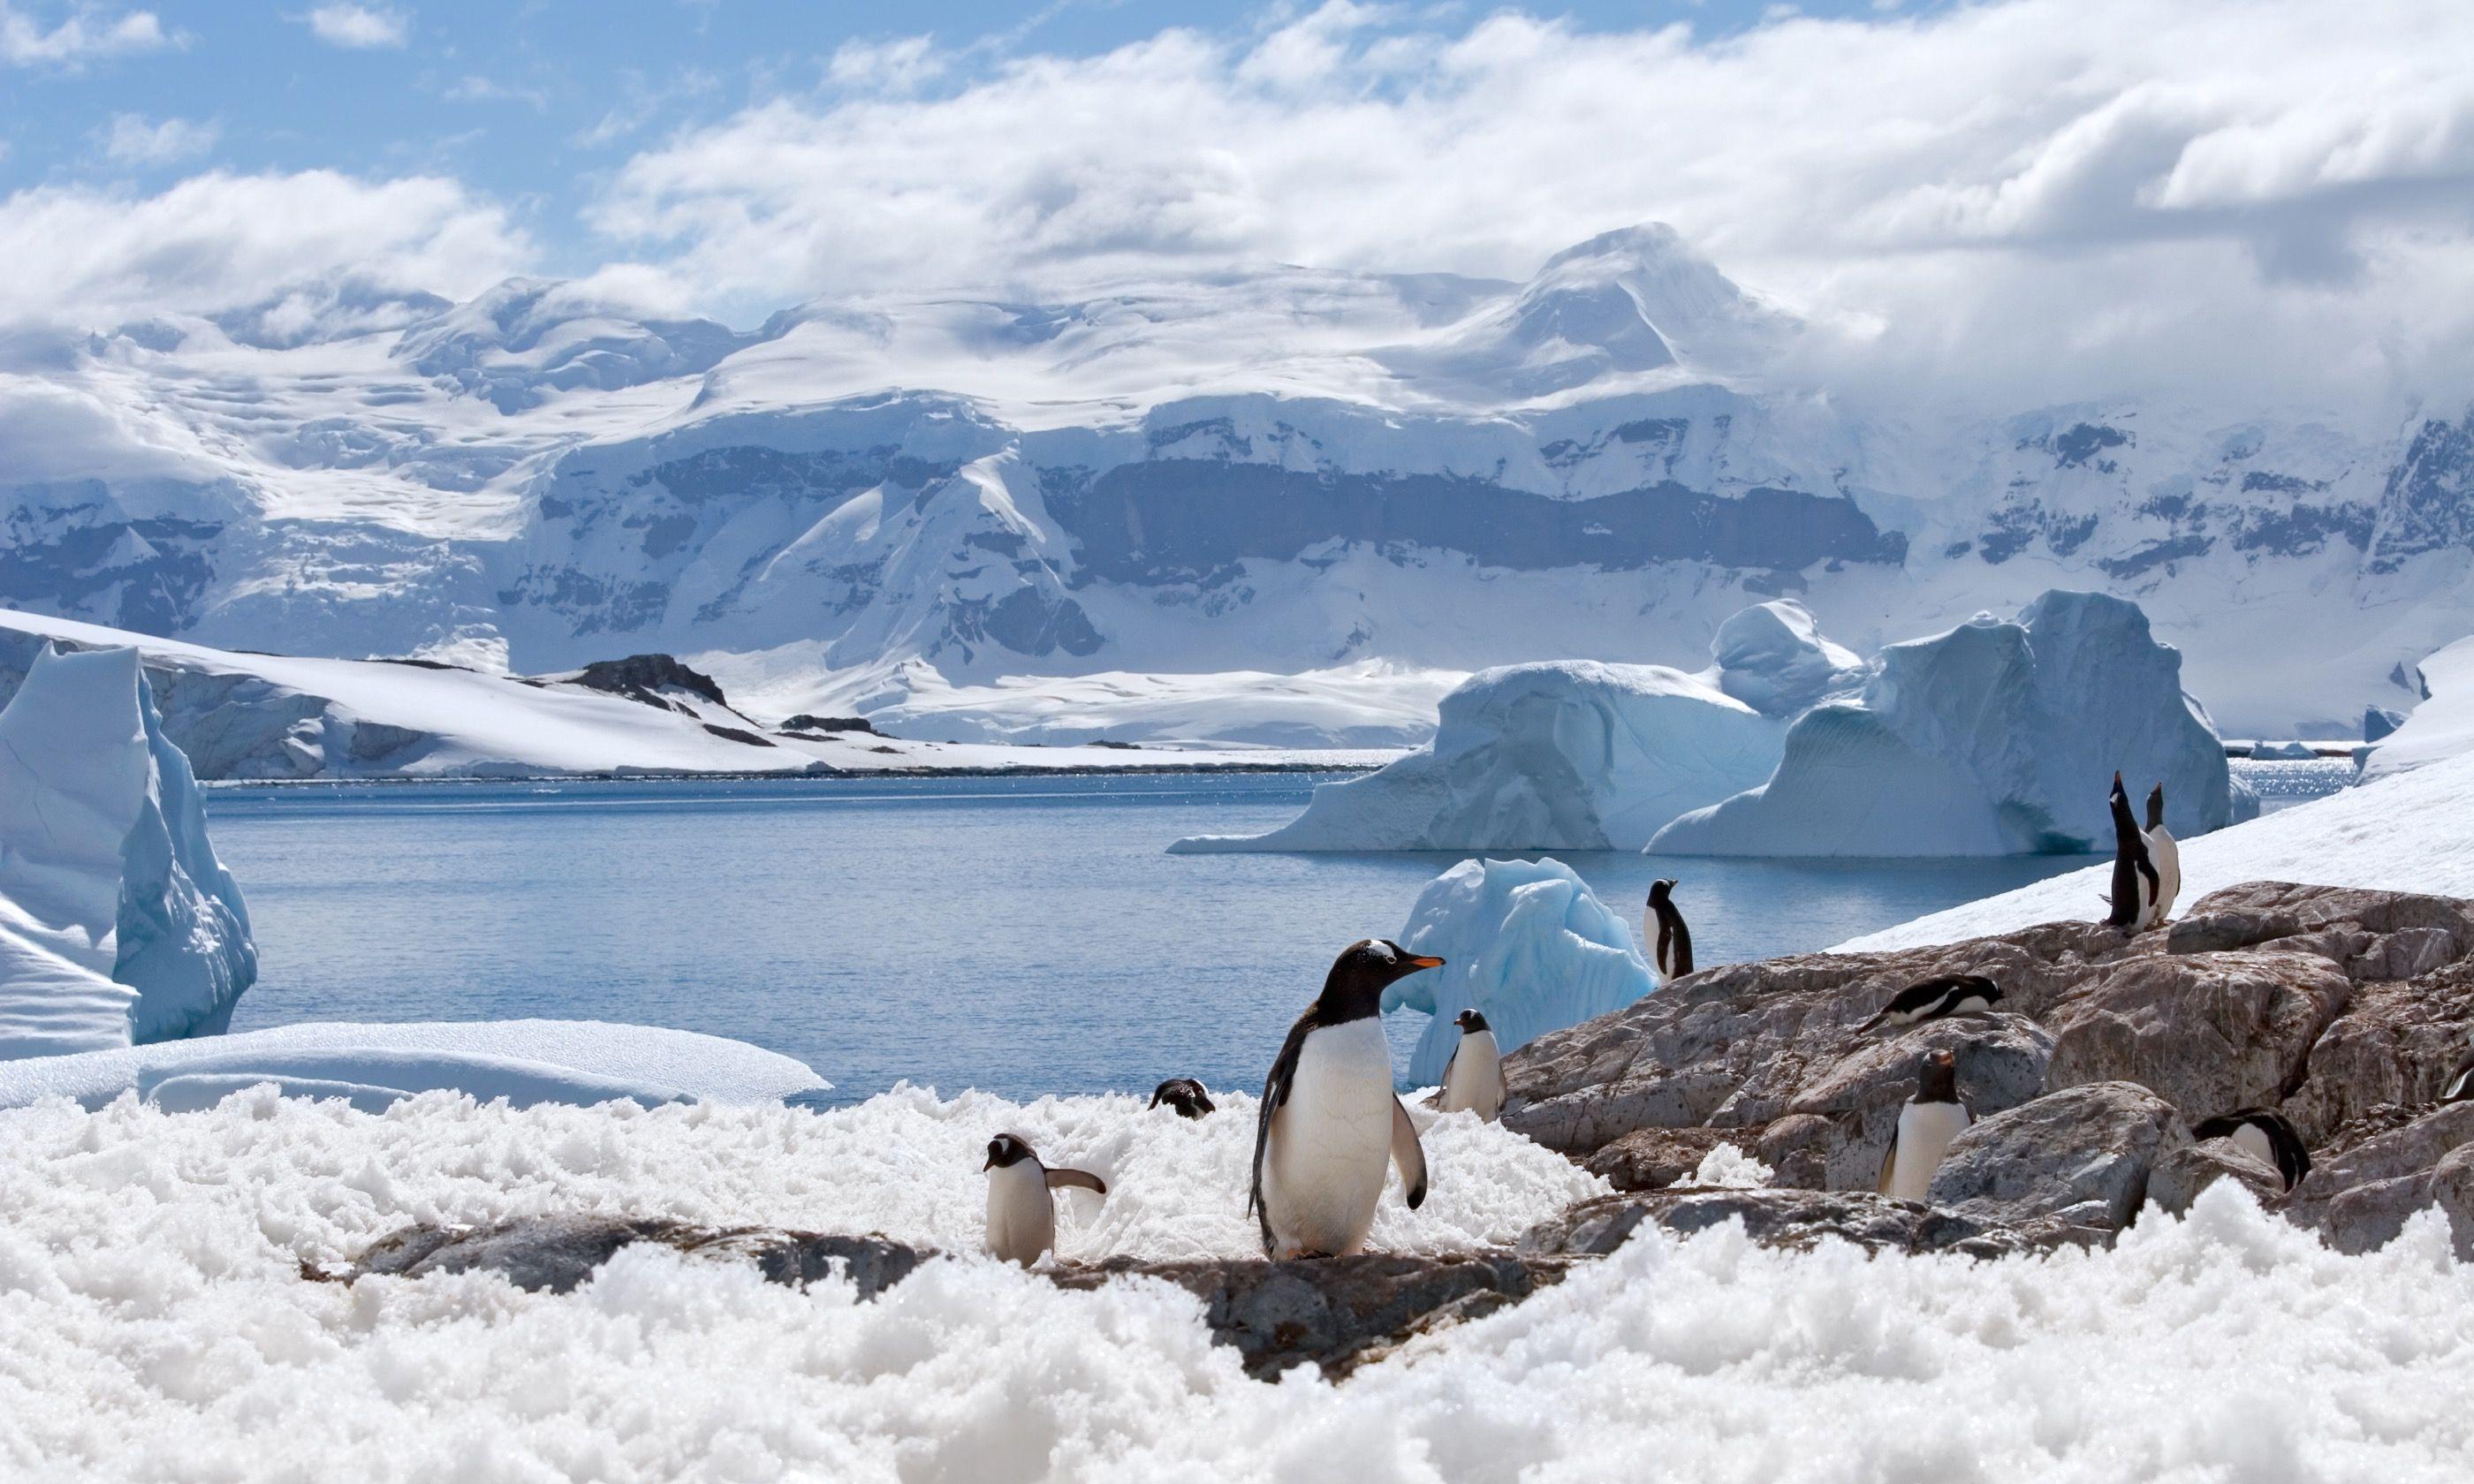 Group of penguins on an ice shelf (Shutterstock.com)